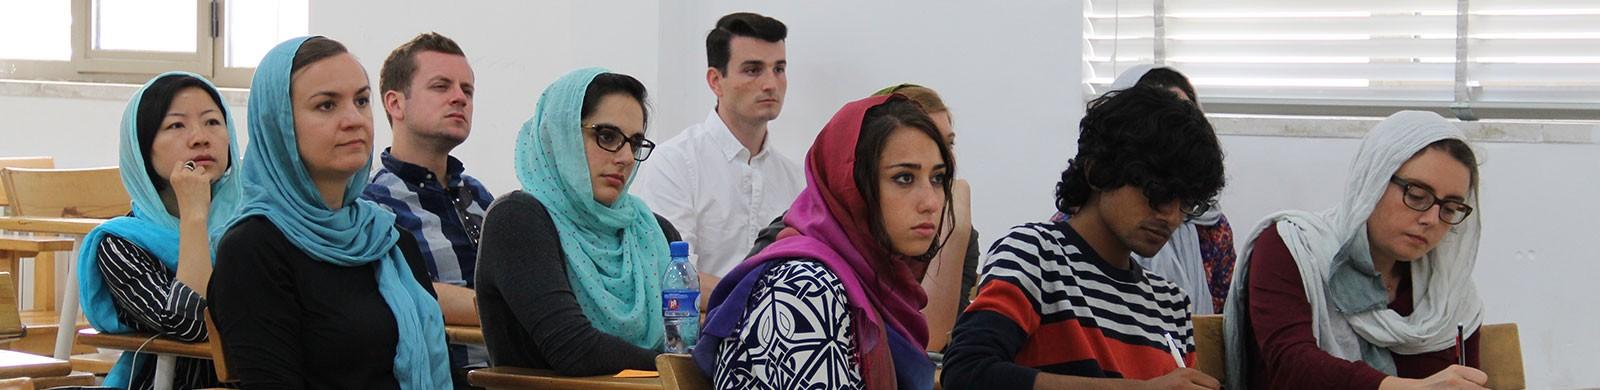 سامانه پذیرش دانشجویان غیرایرانی - سامانه پذیرش دانشجویان خارجی - پذیرش دانشجو